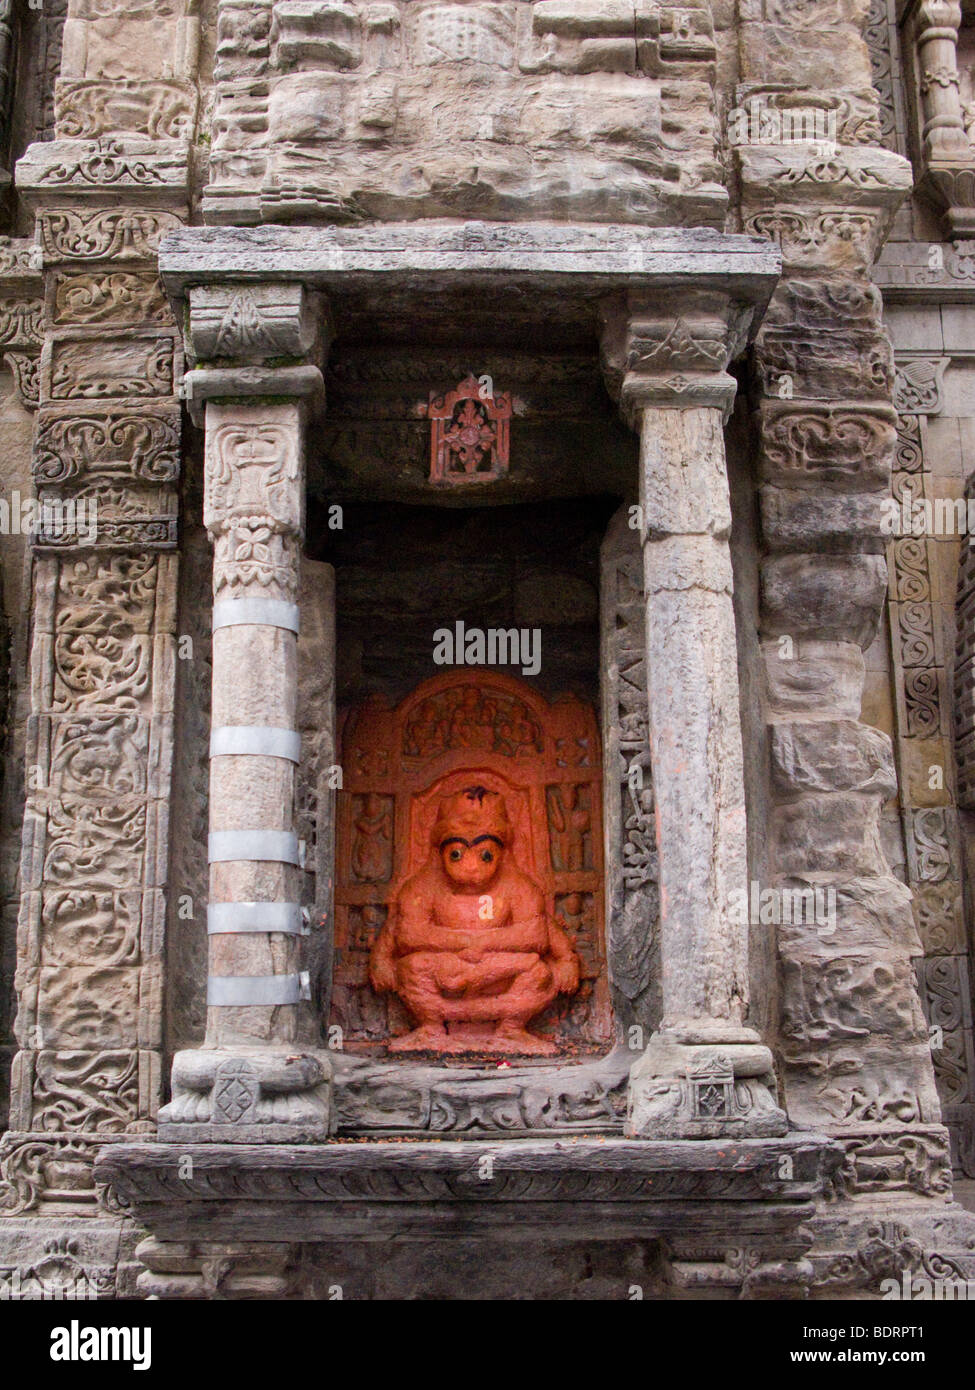 Monkey deity on the side of a Shikhara / Sikhara tower in the Laxmi Narayan Temple complex. Chamba, Himachal Pradesh. - Stock Image